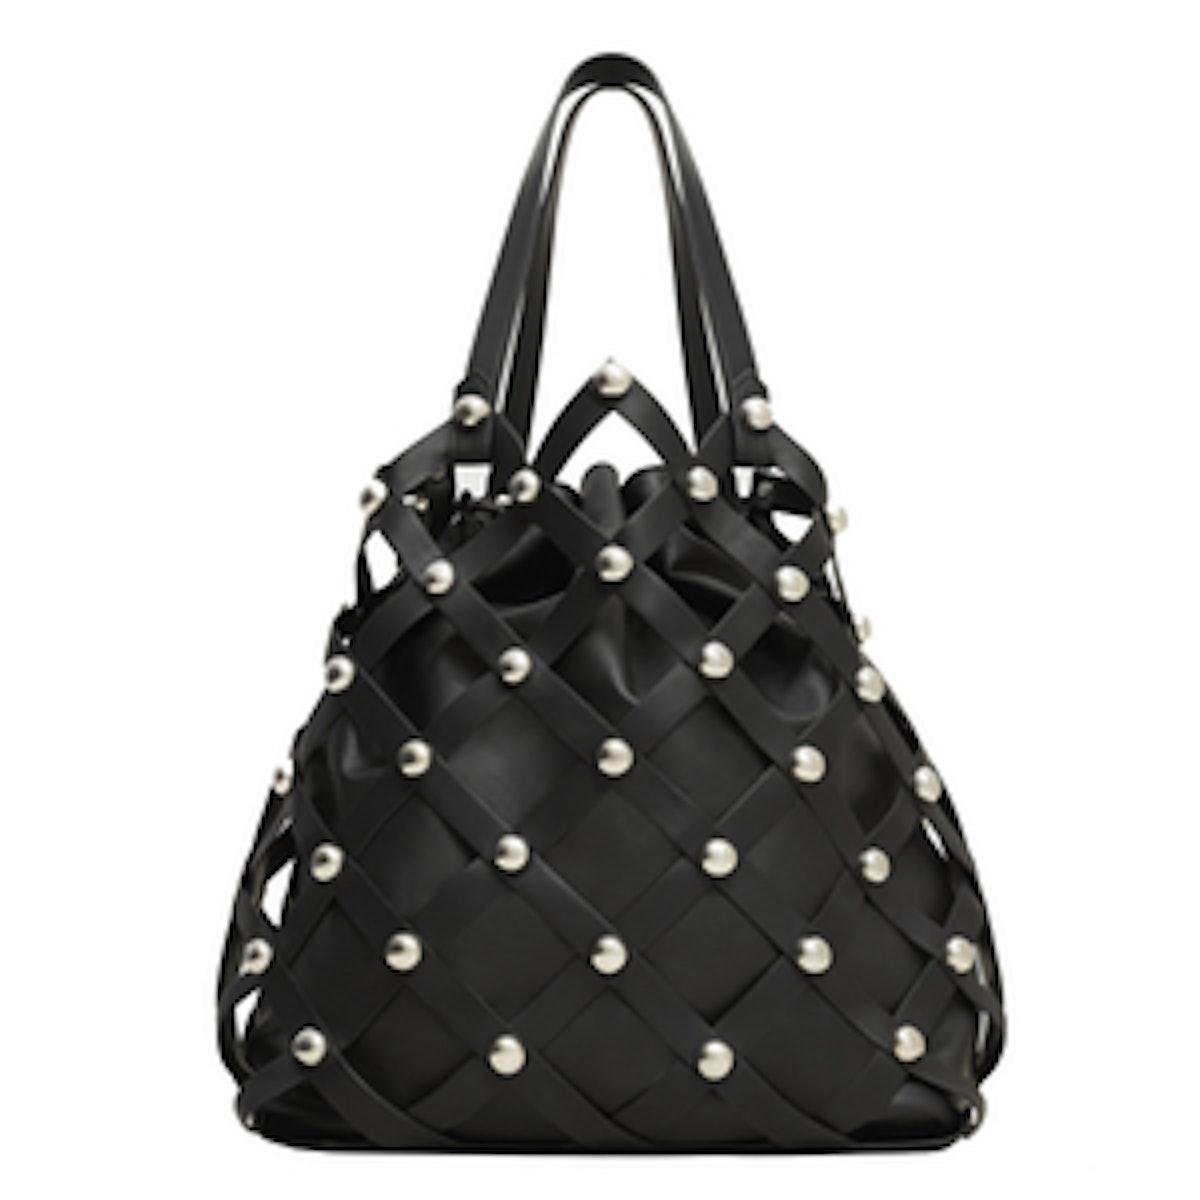 Woven Lattice Bucket Bag